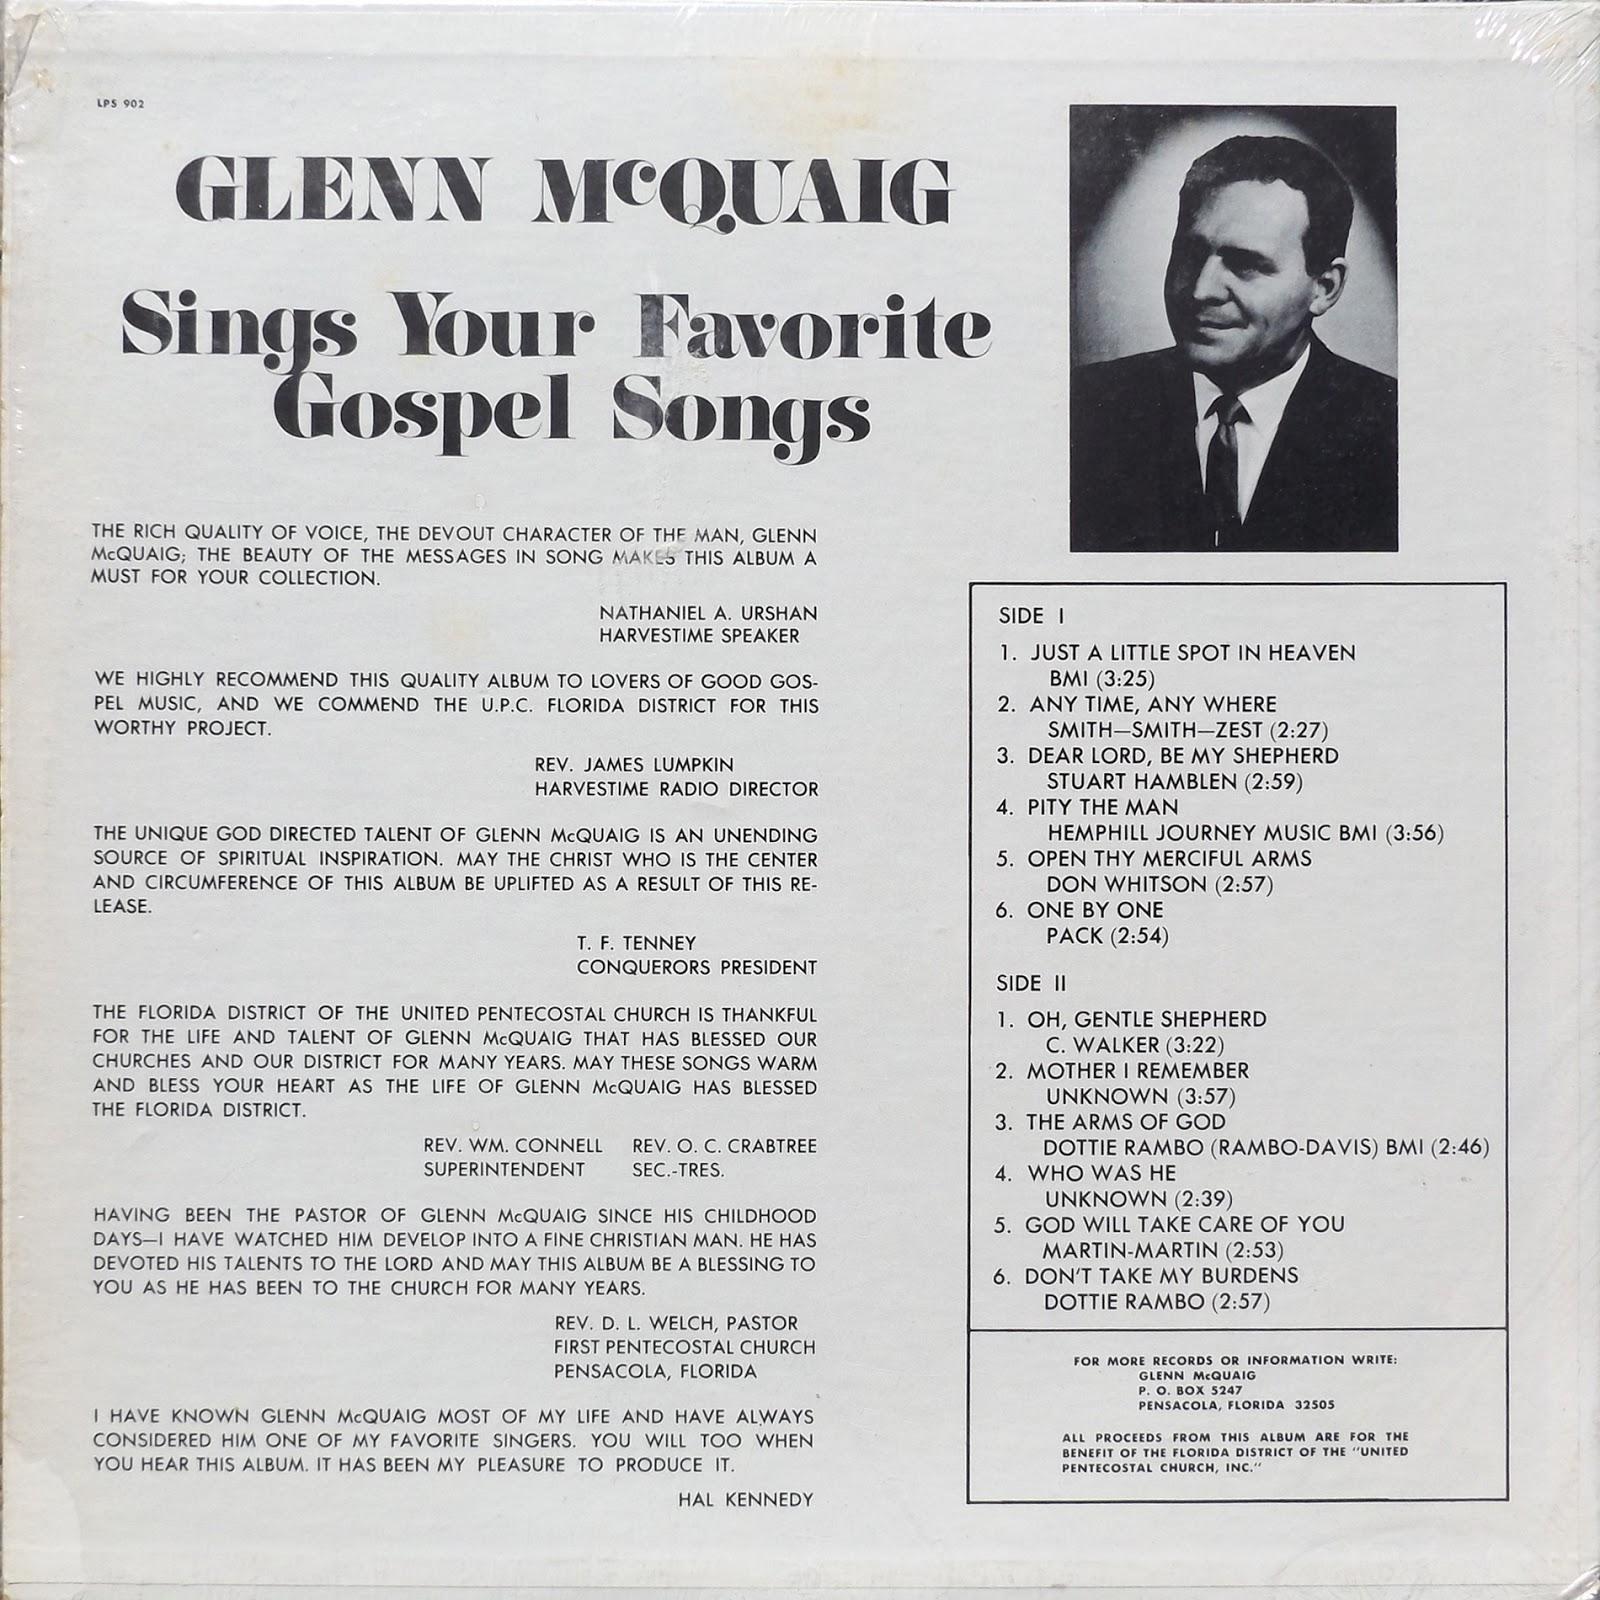 Gospel Church Songs